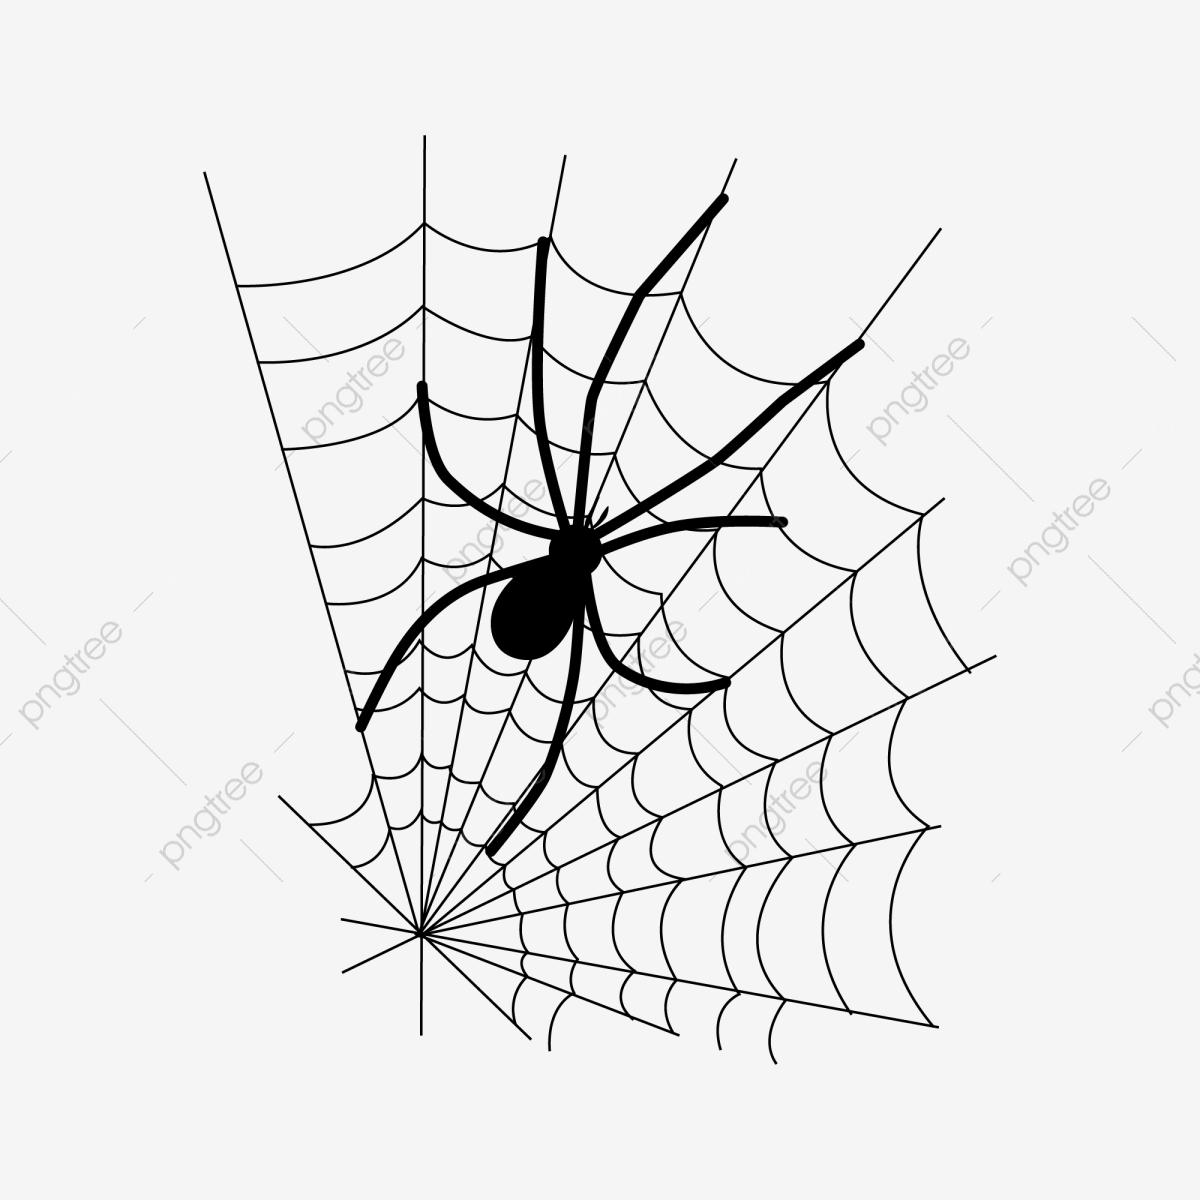 Хэллоуин пауки красивые картинки (19)